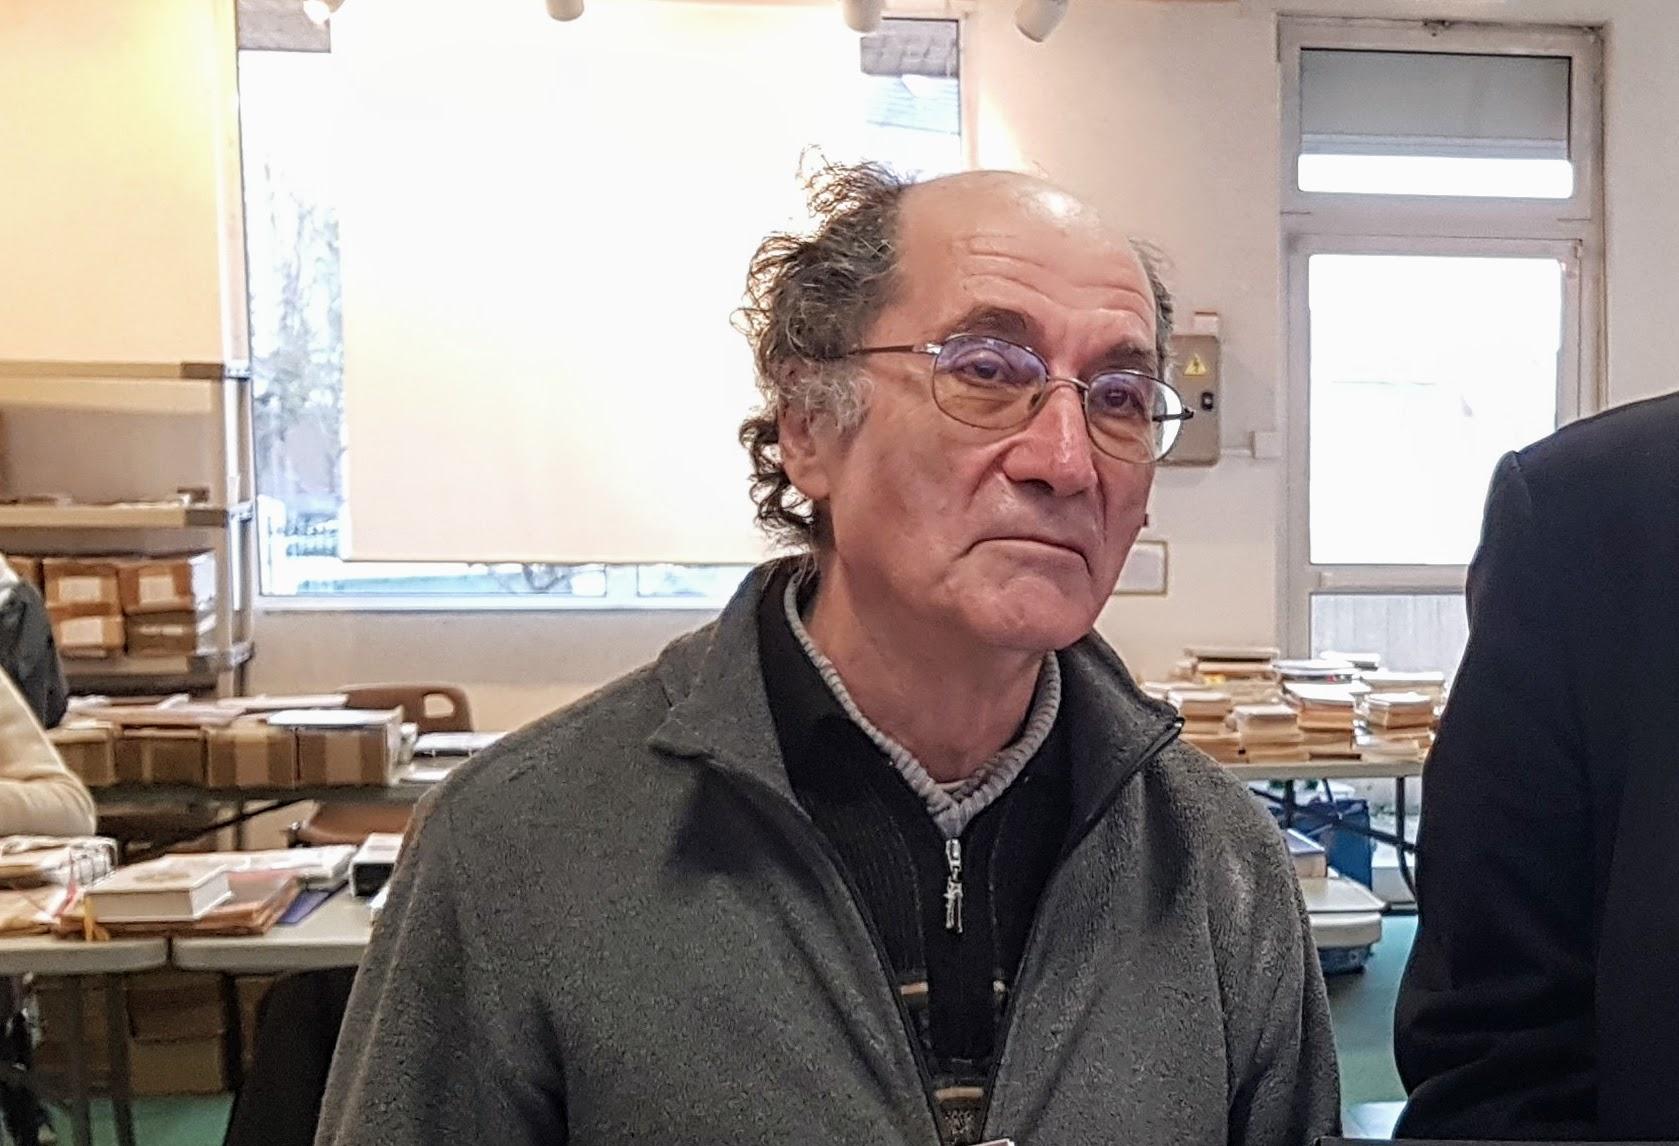 Claude Barouh